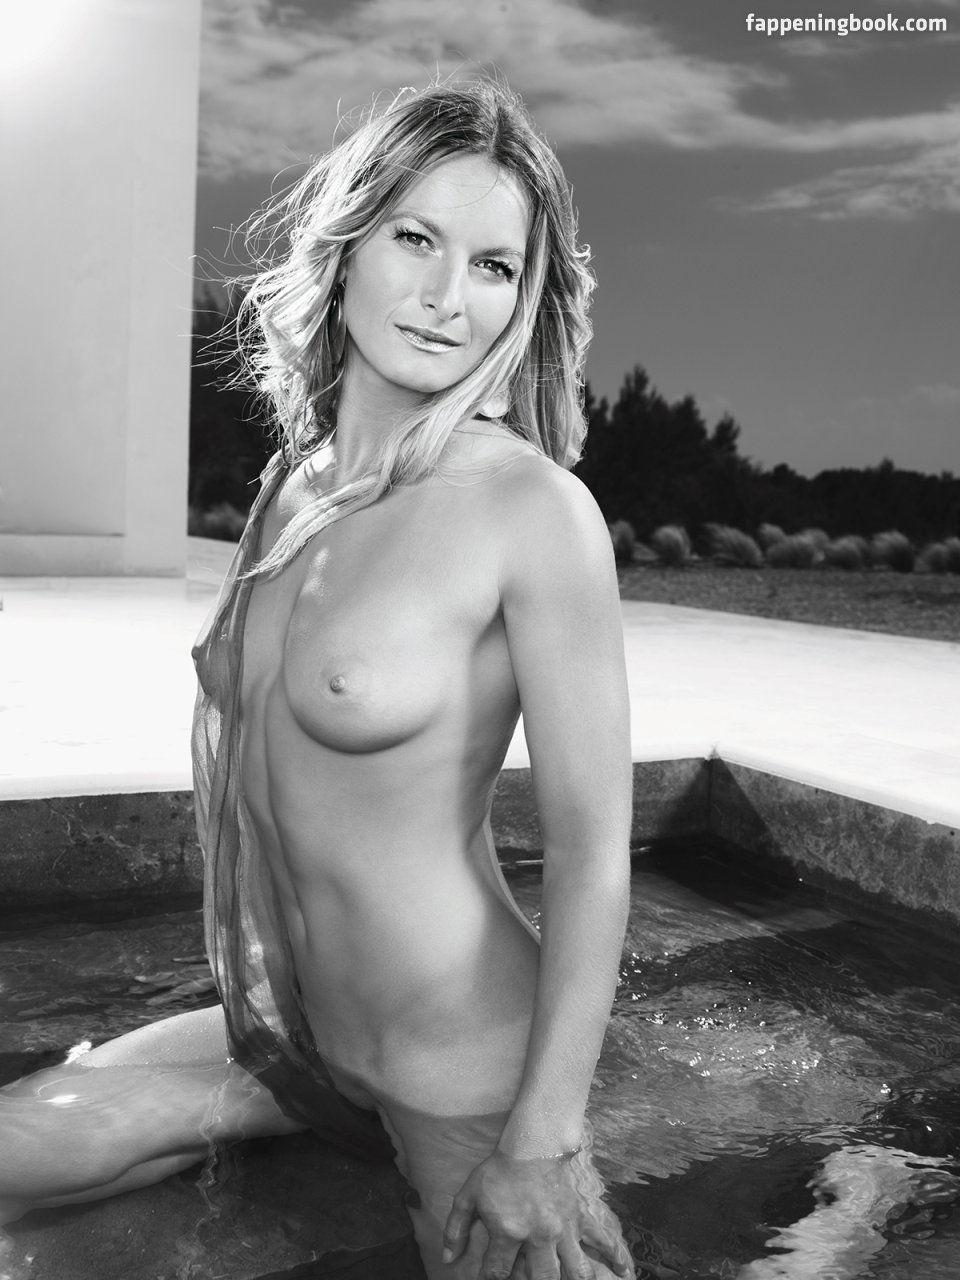 Margerita waldmann nude